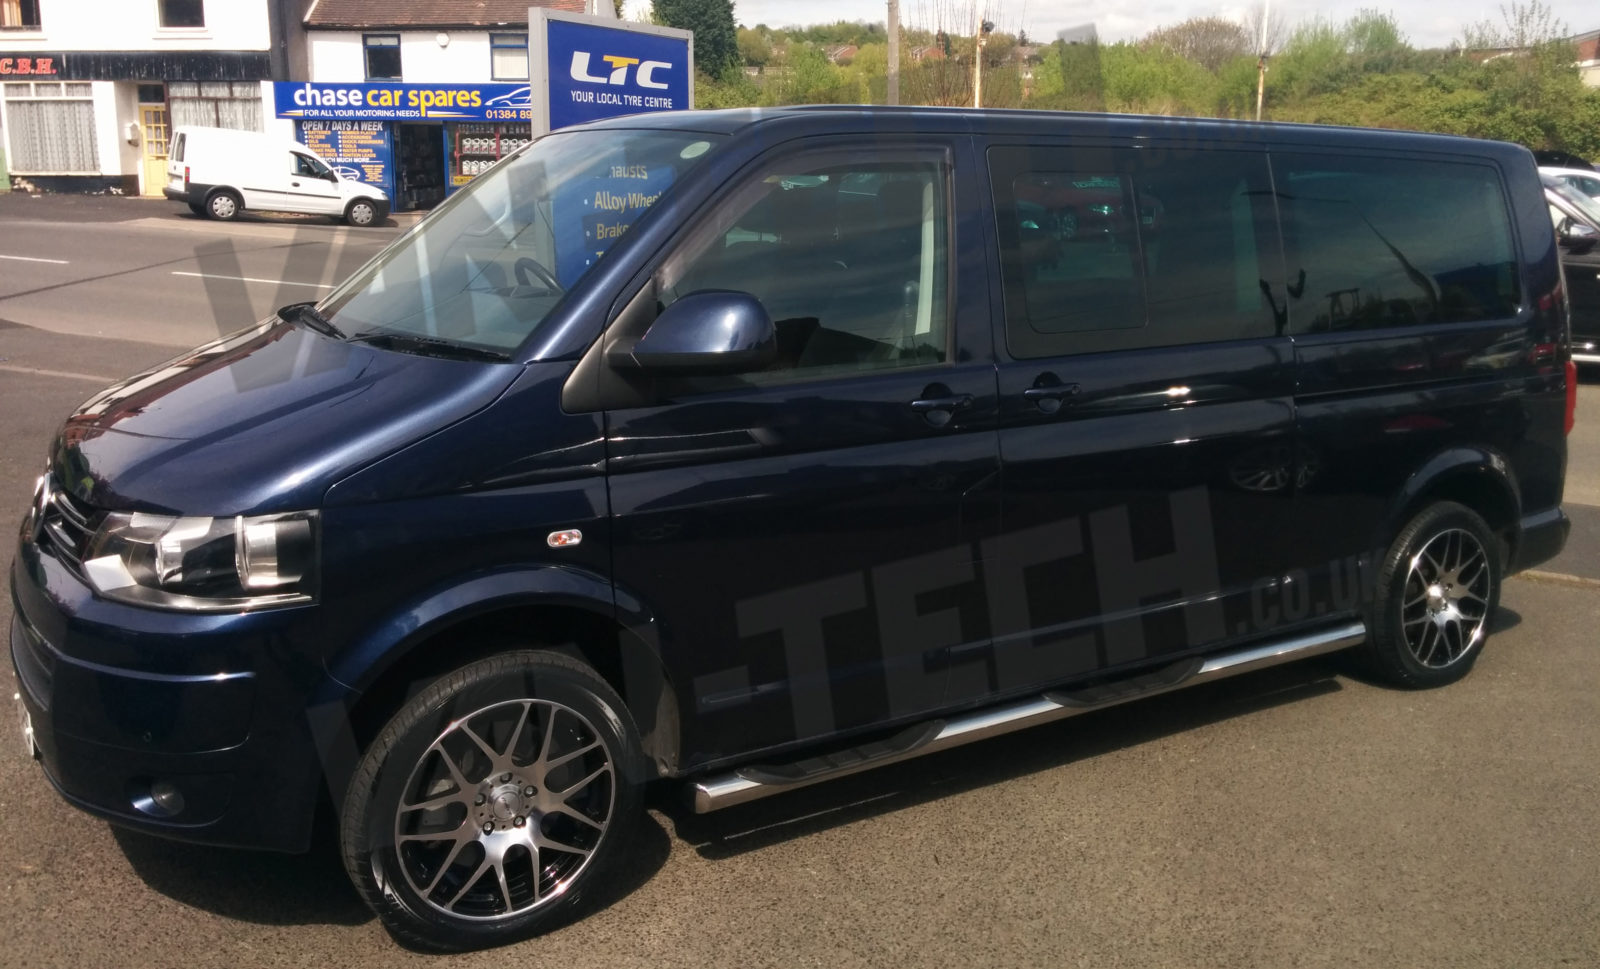 calibre exile 18 alloy wheels polished black vw t5 van van tech. Black Bedroom Furniture Sets. Home Design Ideas